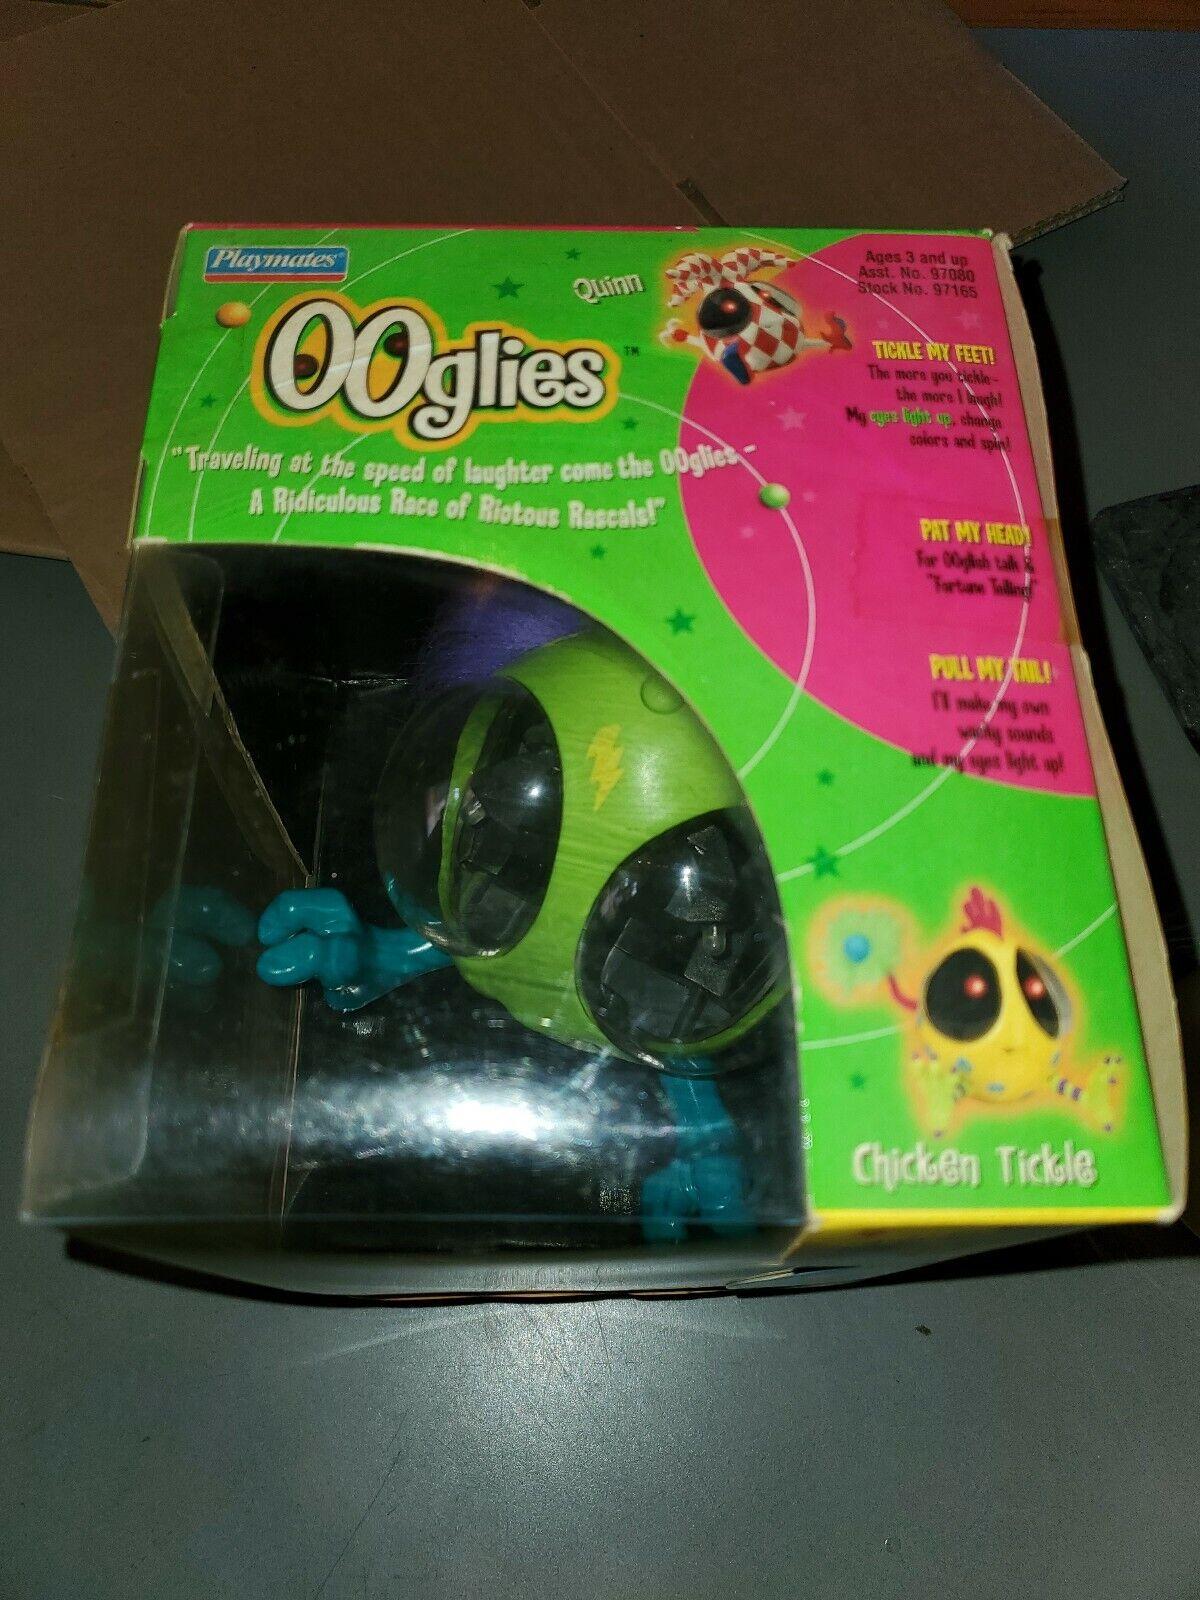 *RARE* NOS OOGLIES GORLON Playmates ANIMATED Interactive HTF NEW VINTAGE 1999